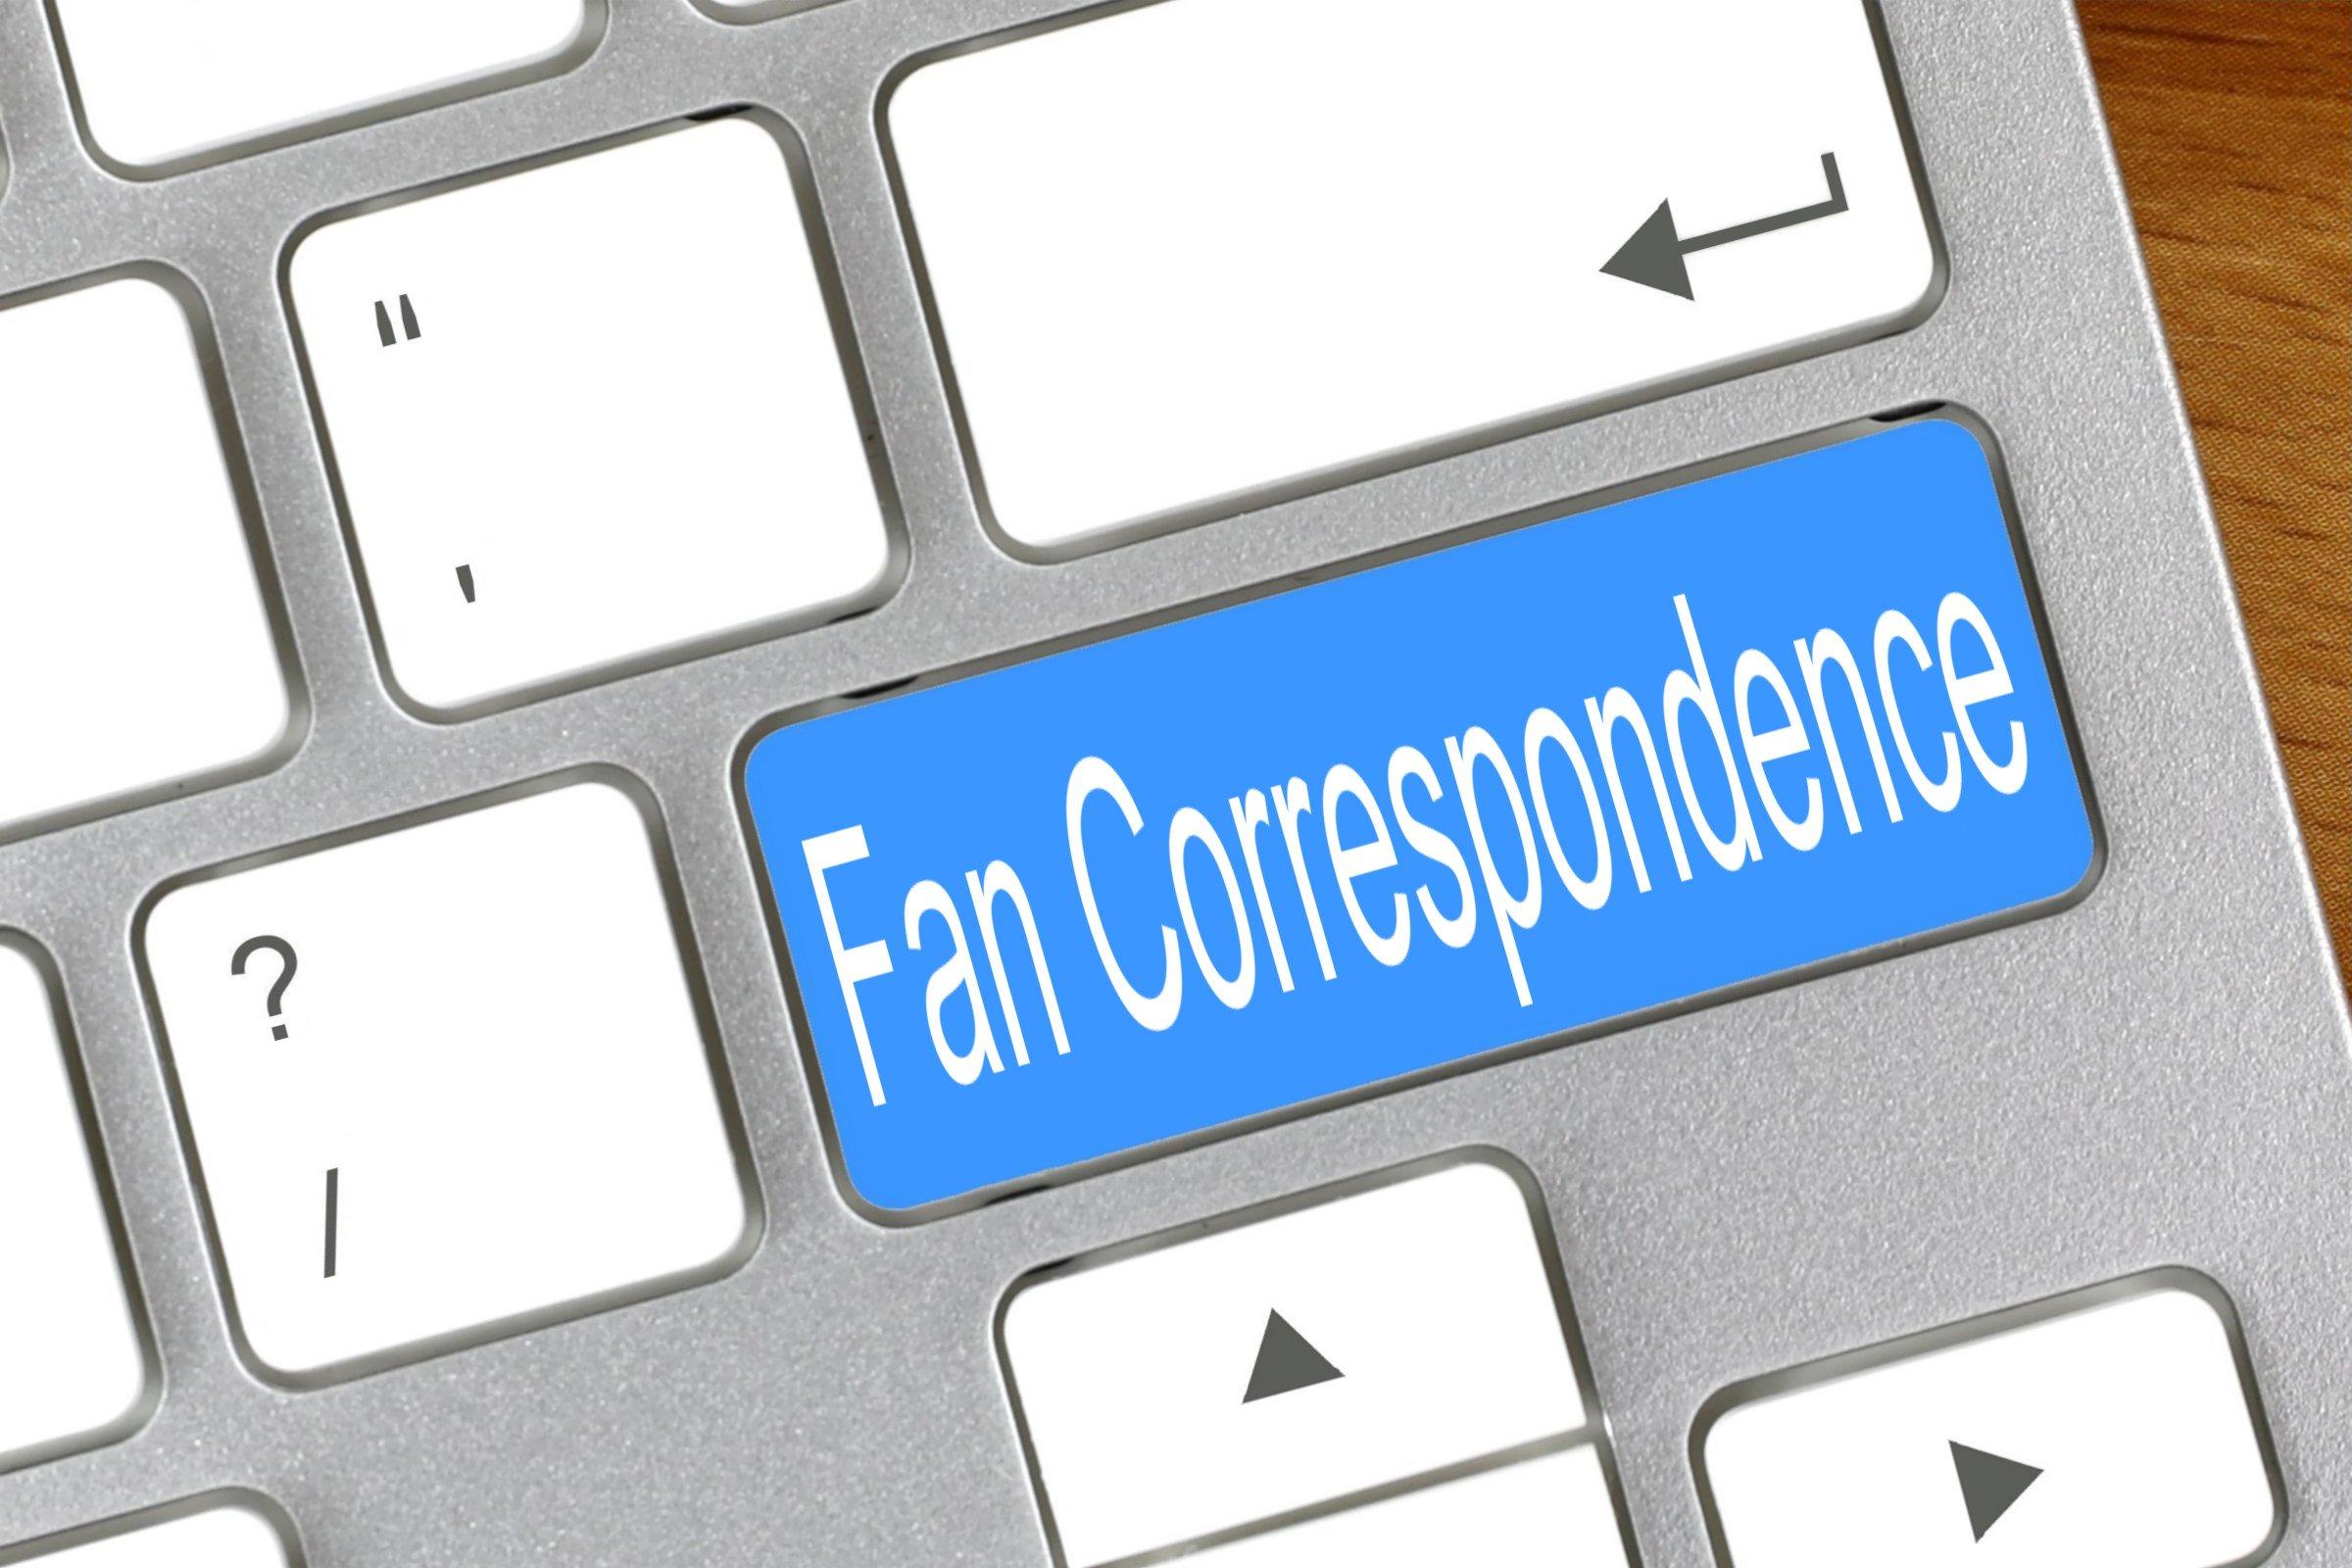 Fan Correspondence